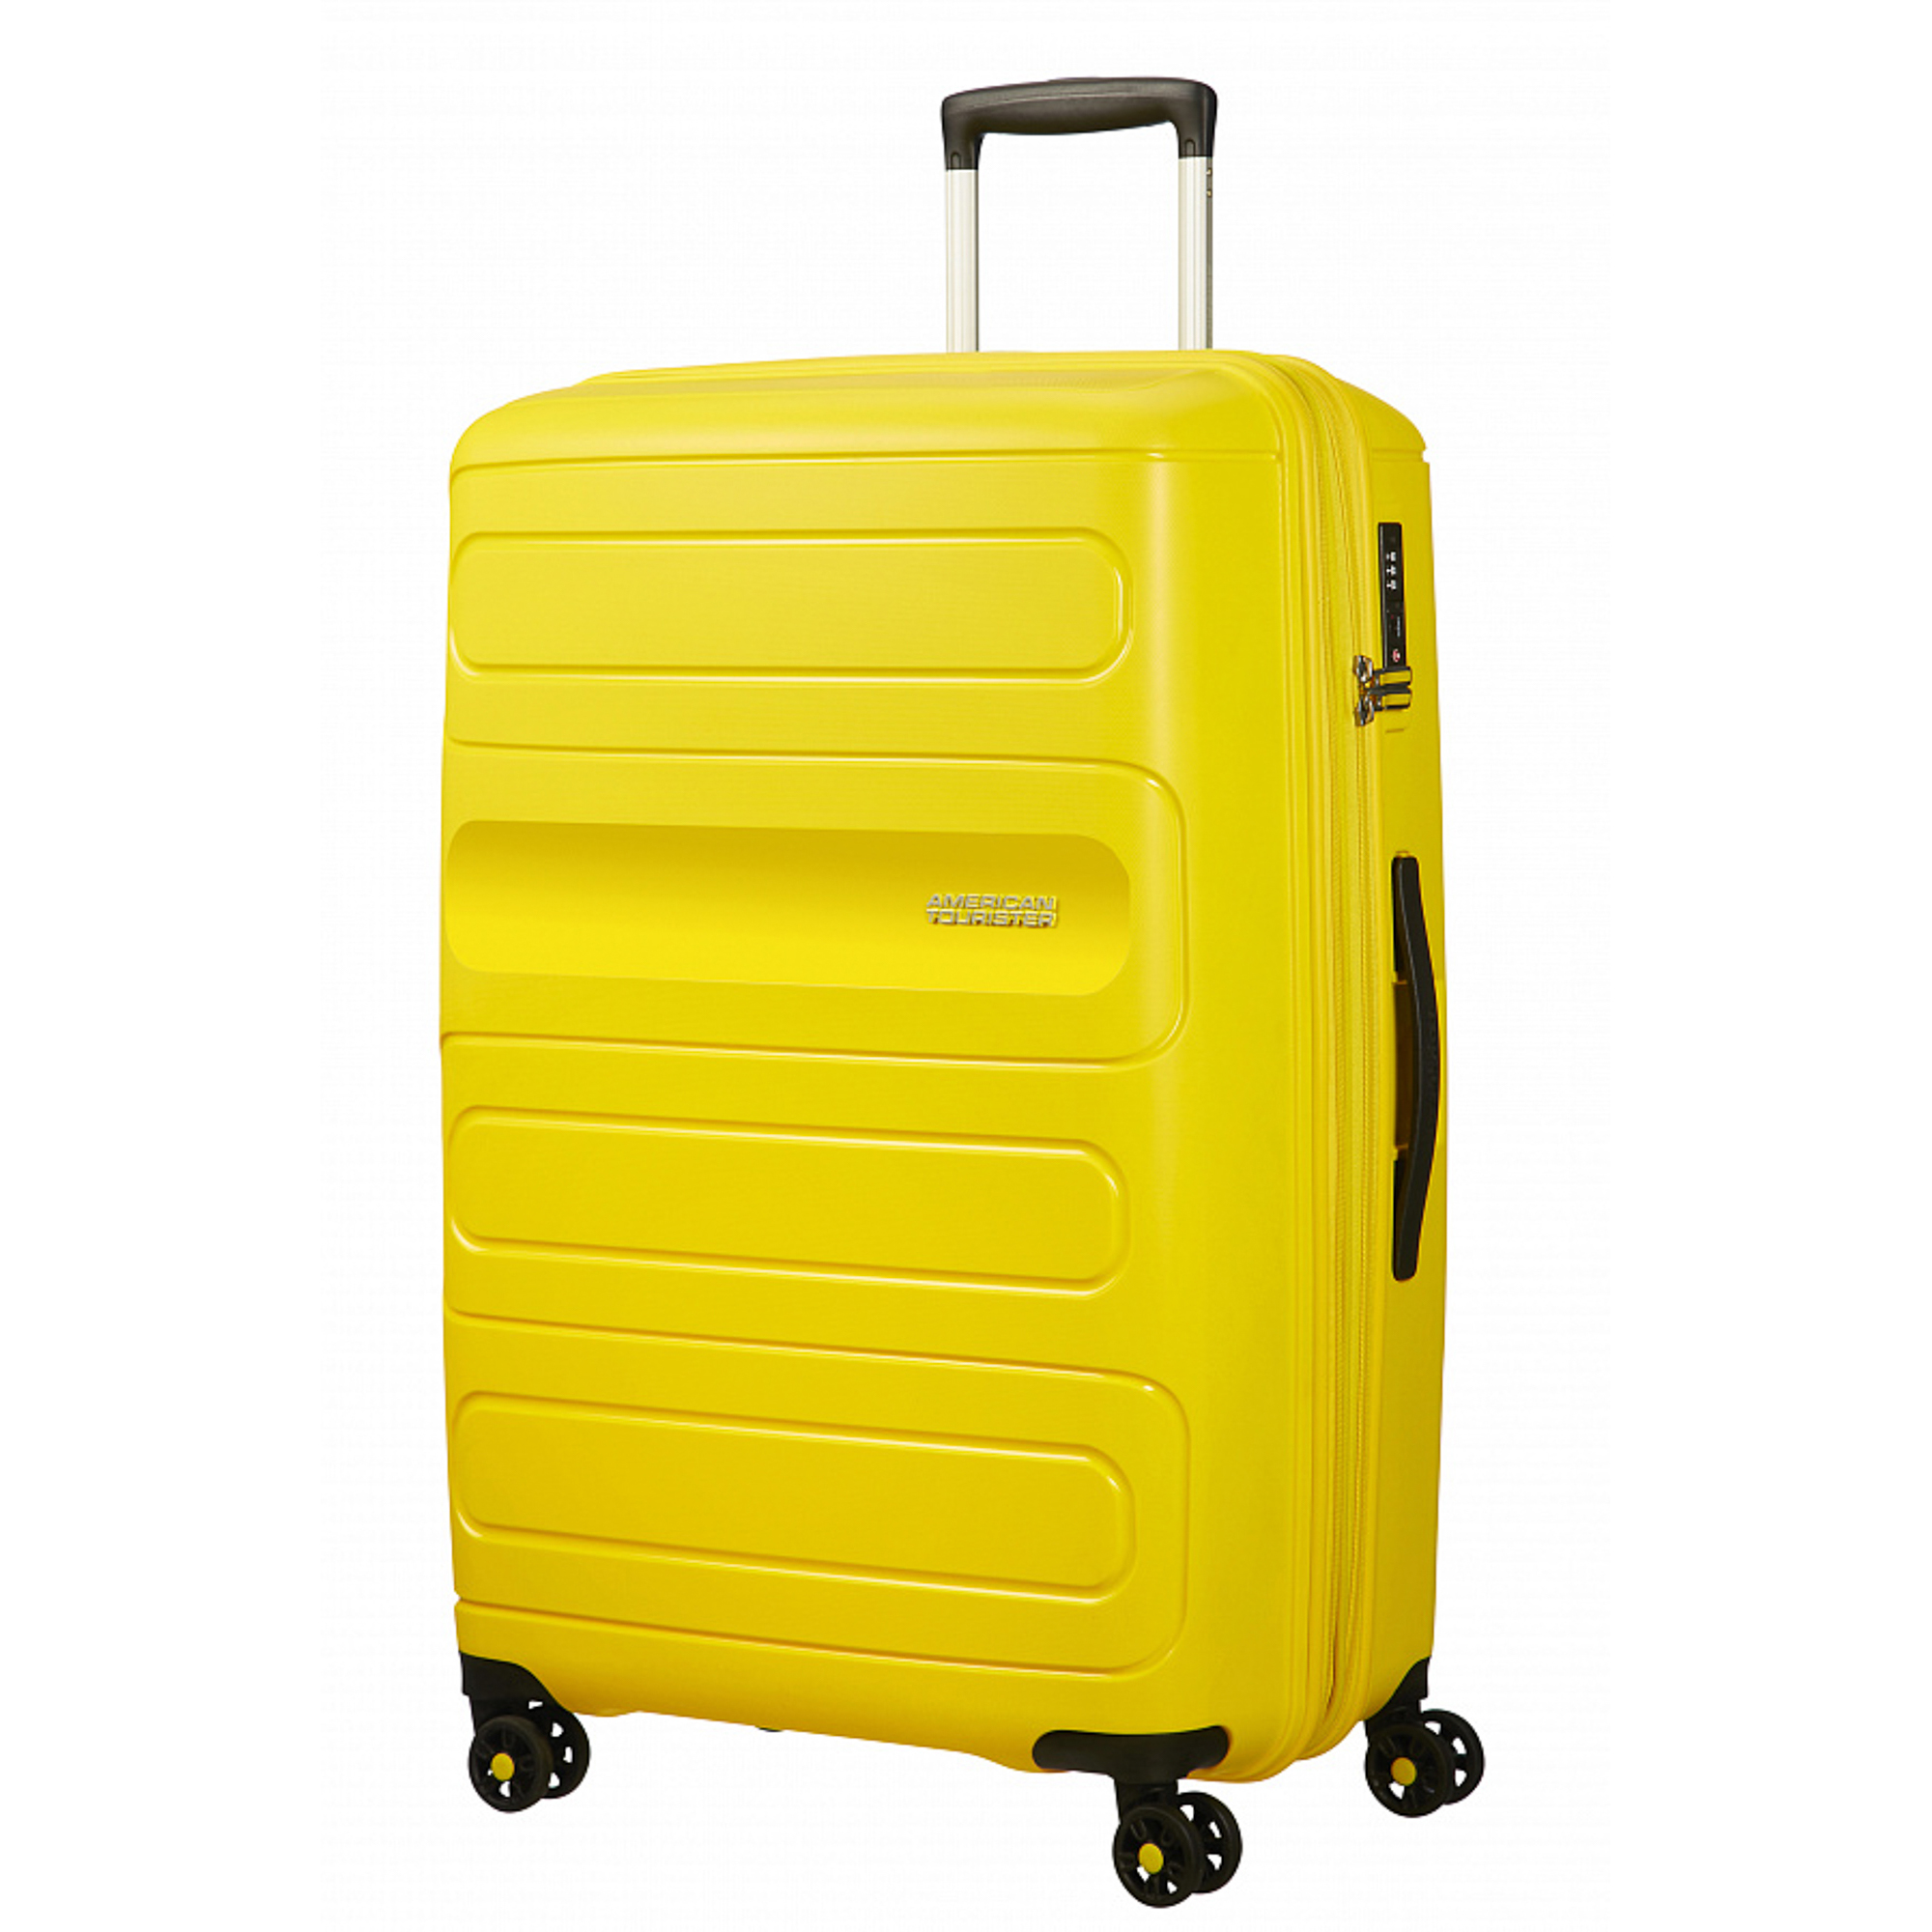 Чемодан American Tourister Sunside желтый L american tourister american tourister litewing 38g 09003